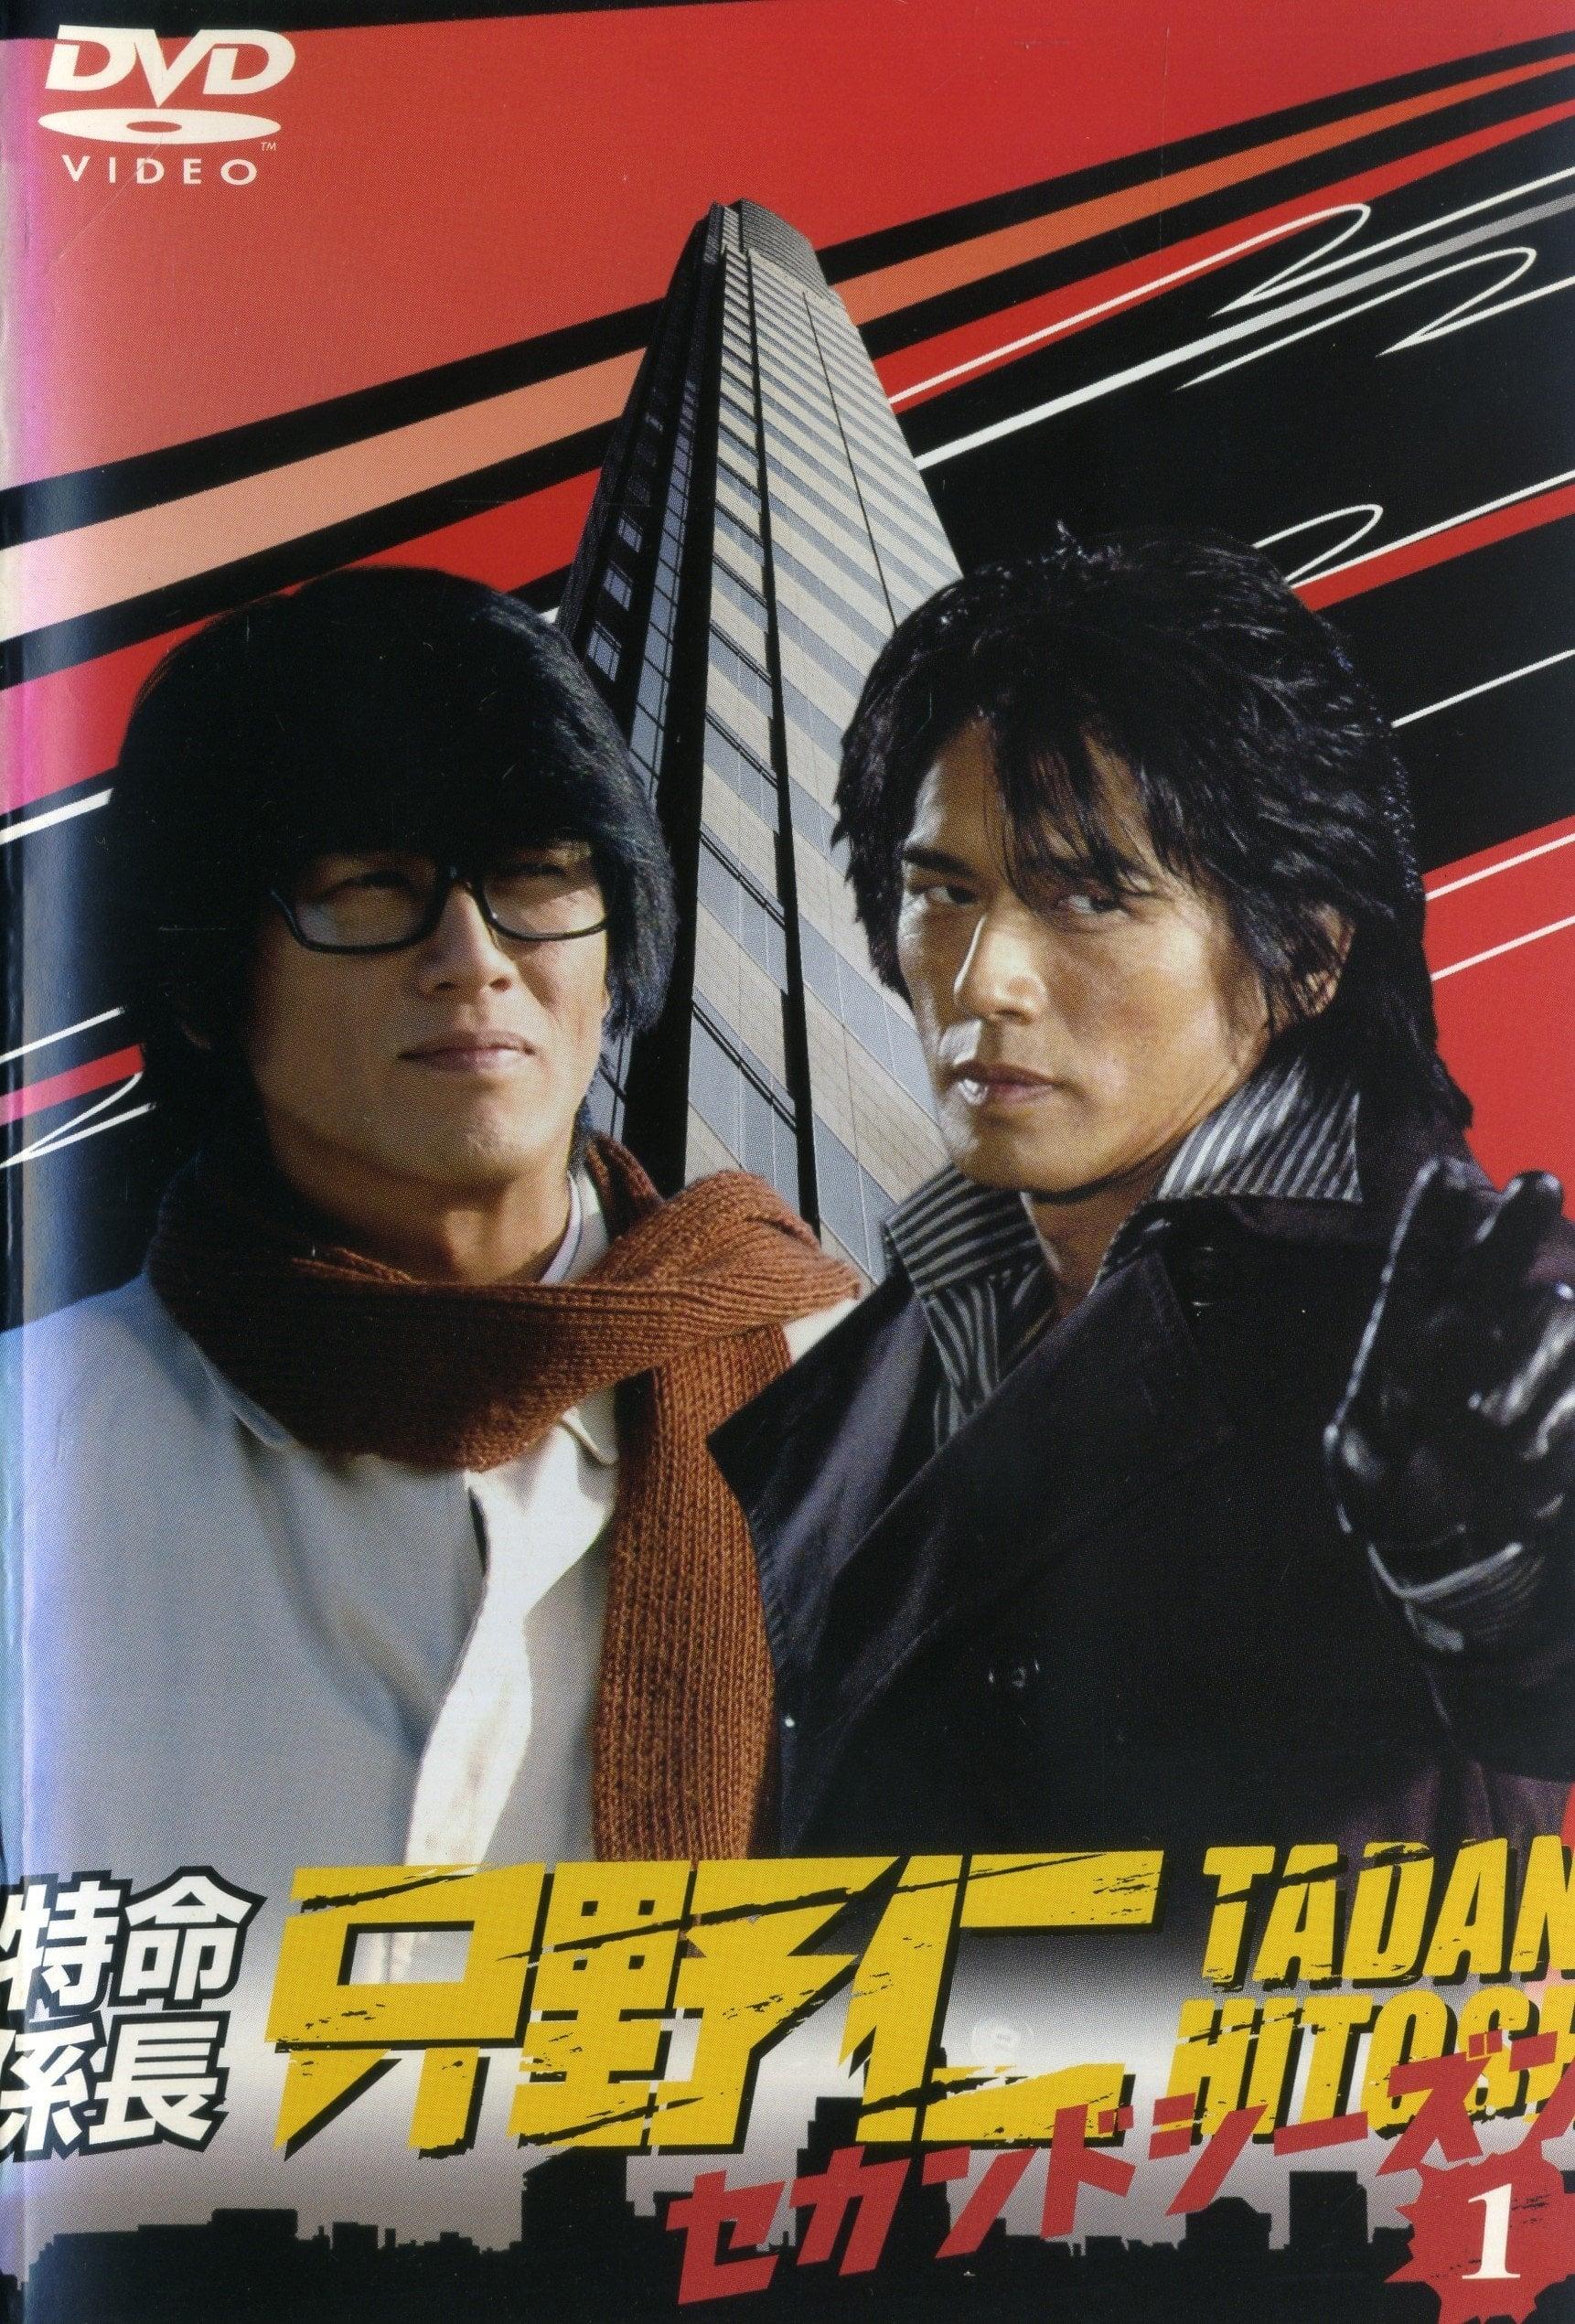 Hitoshi Tadano, the Extraordinary Undercover Detective (2003)